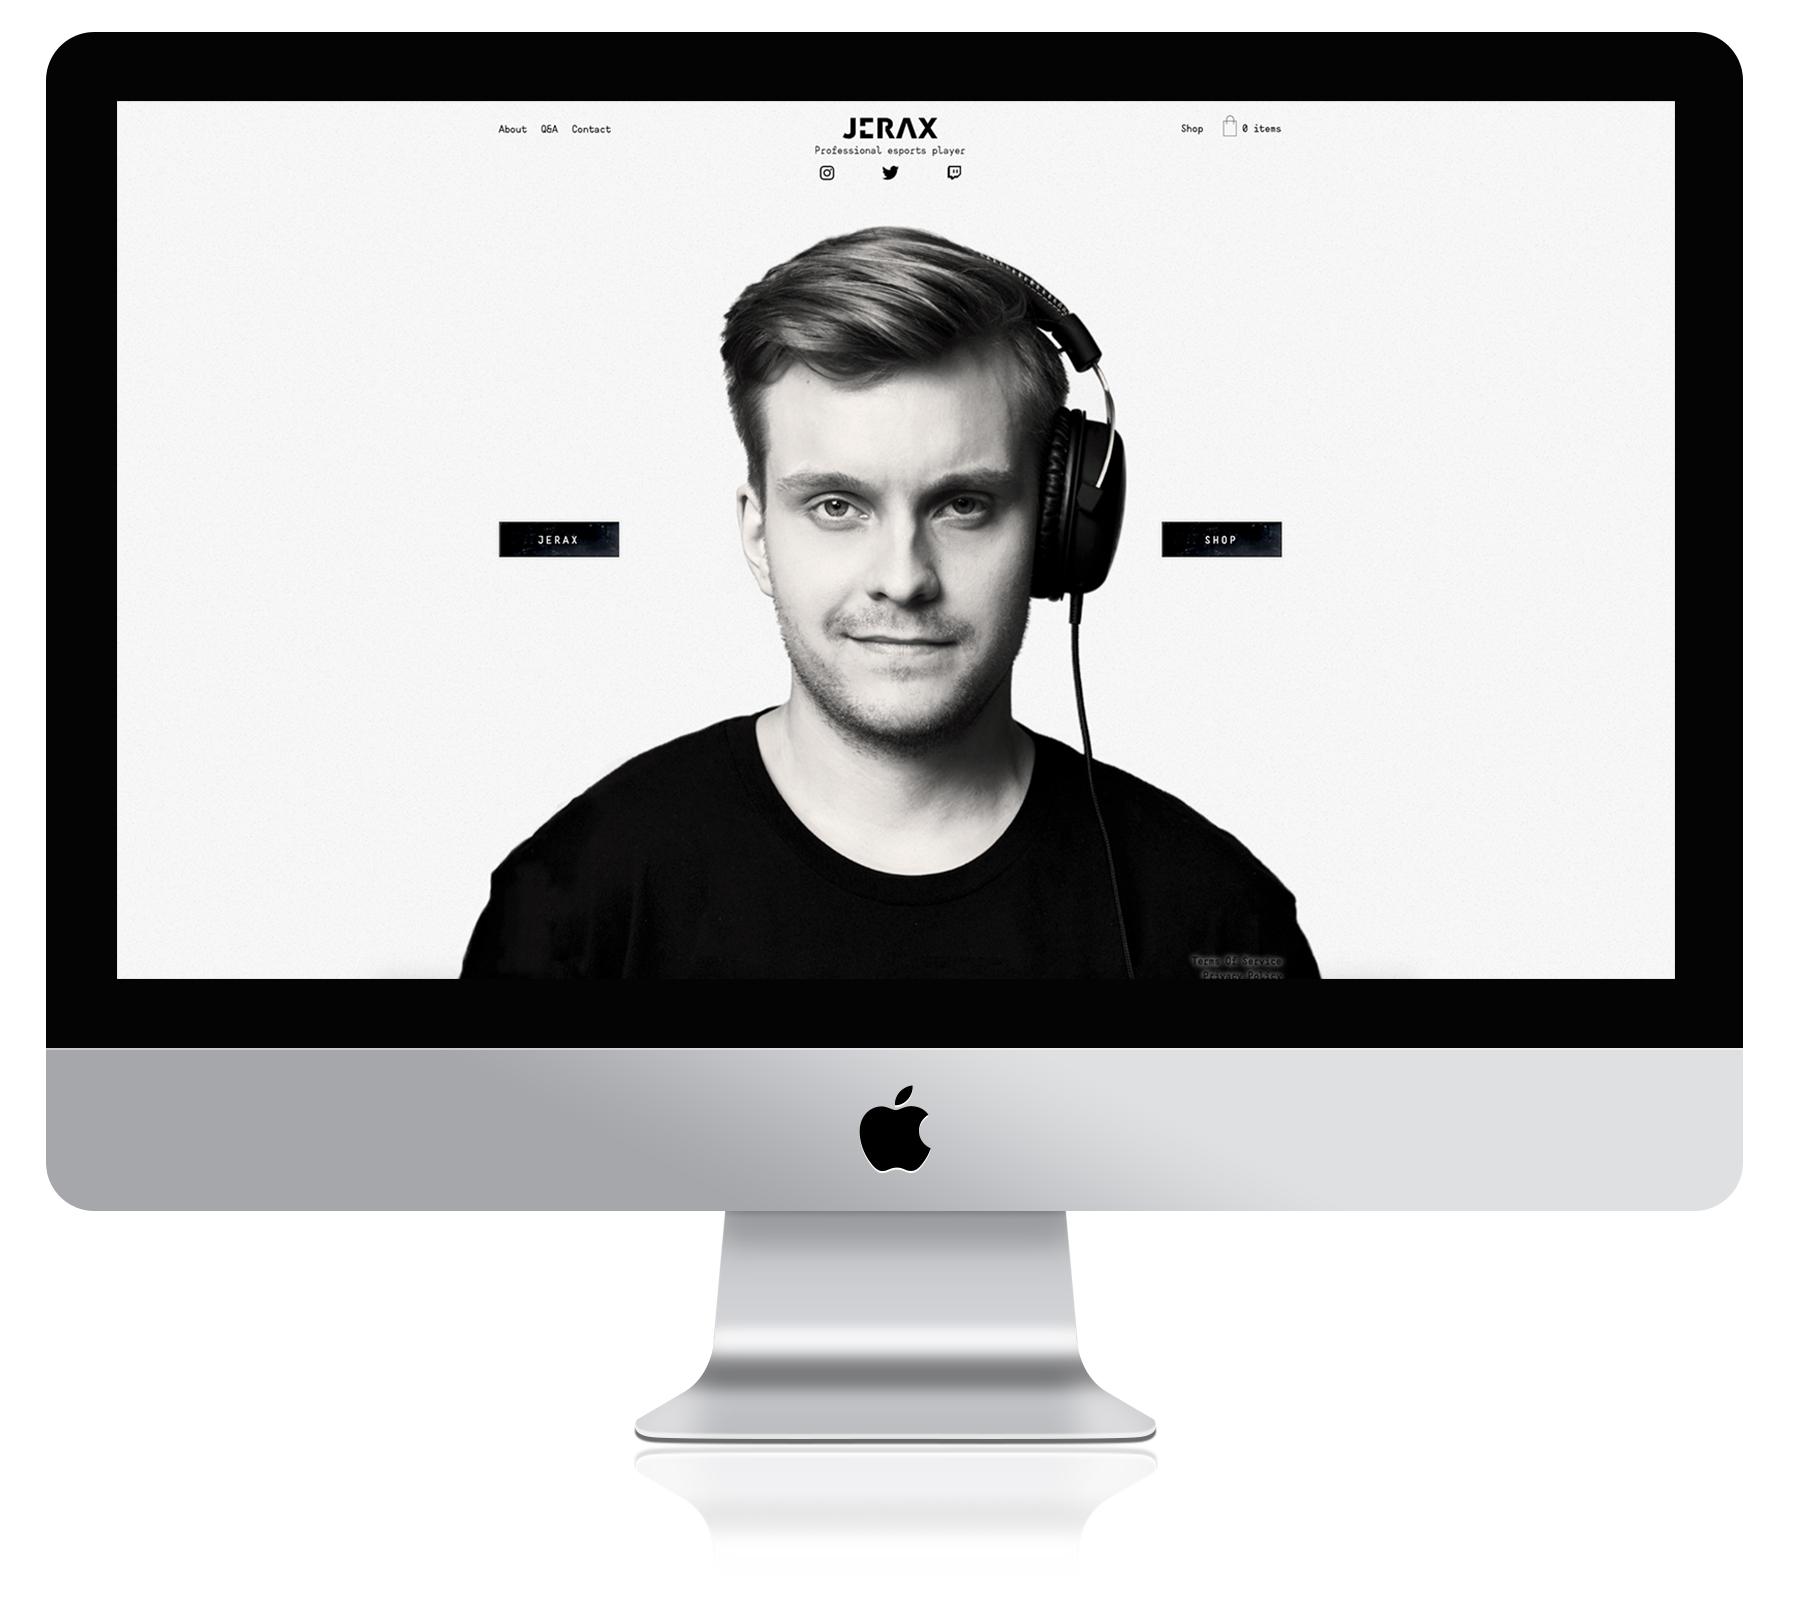 jerax-desktop